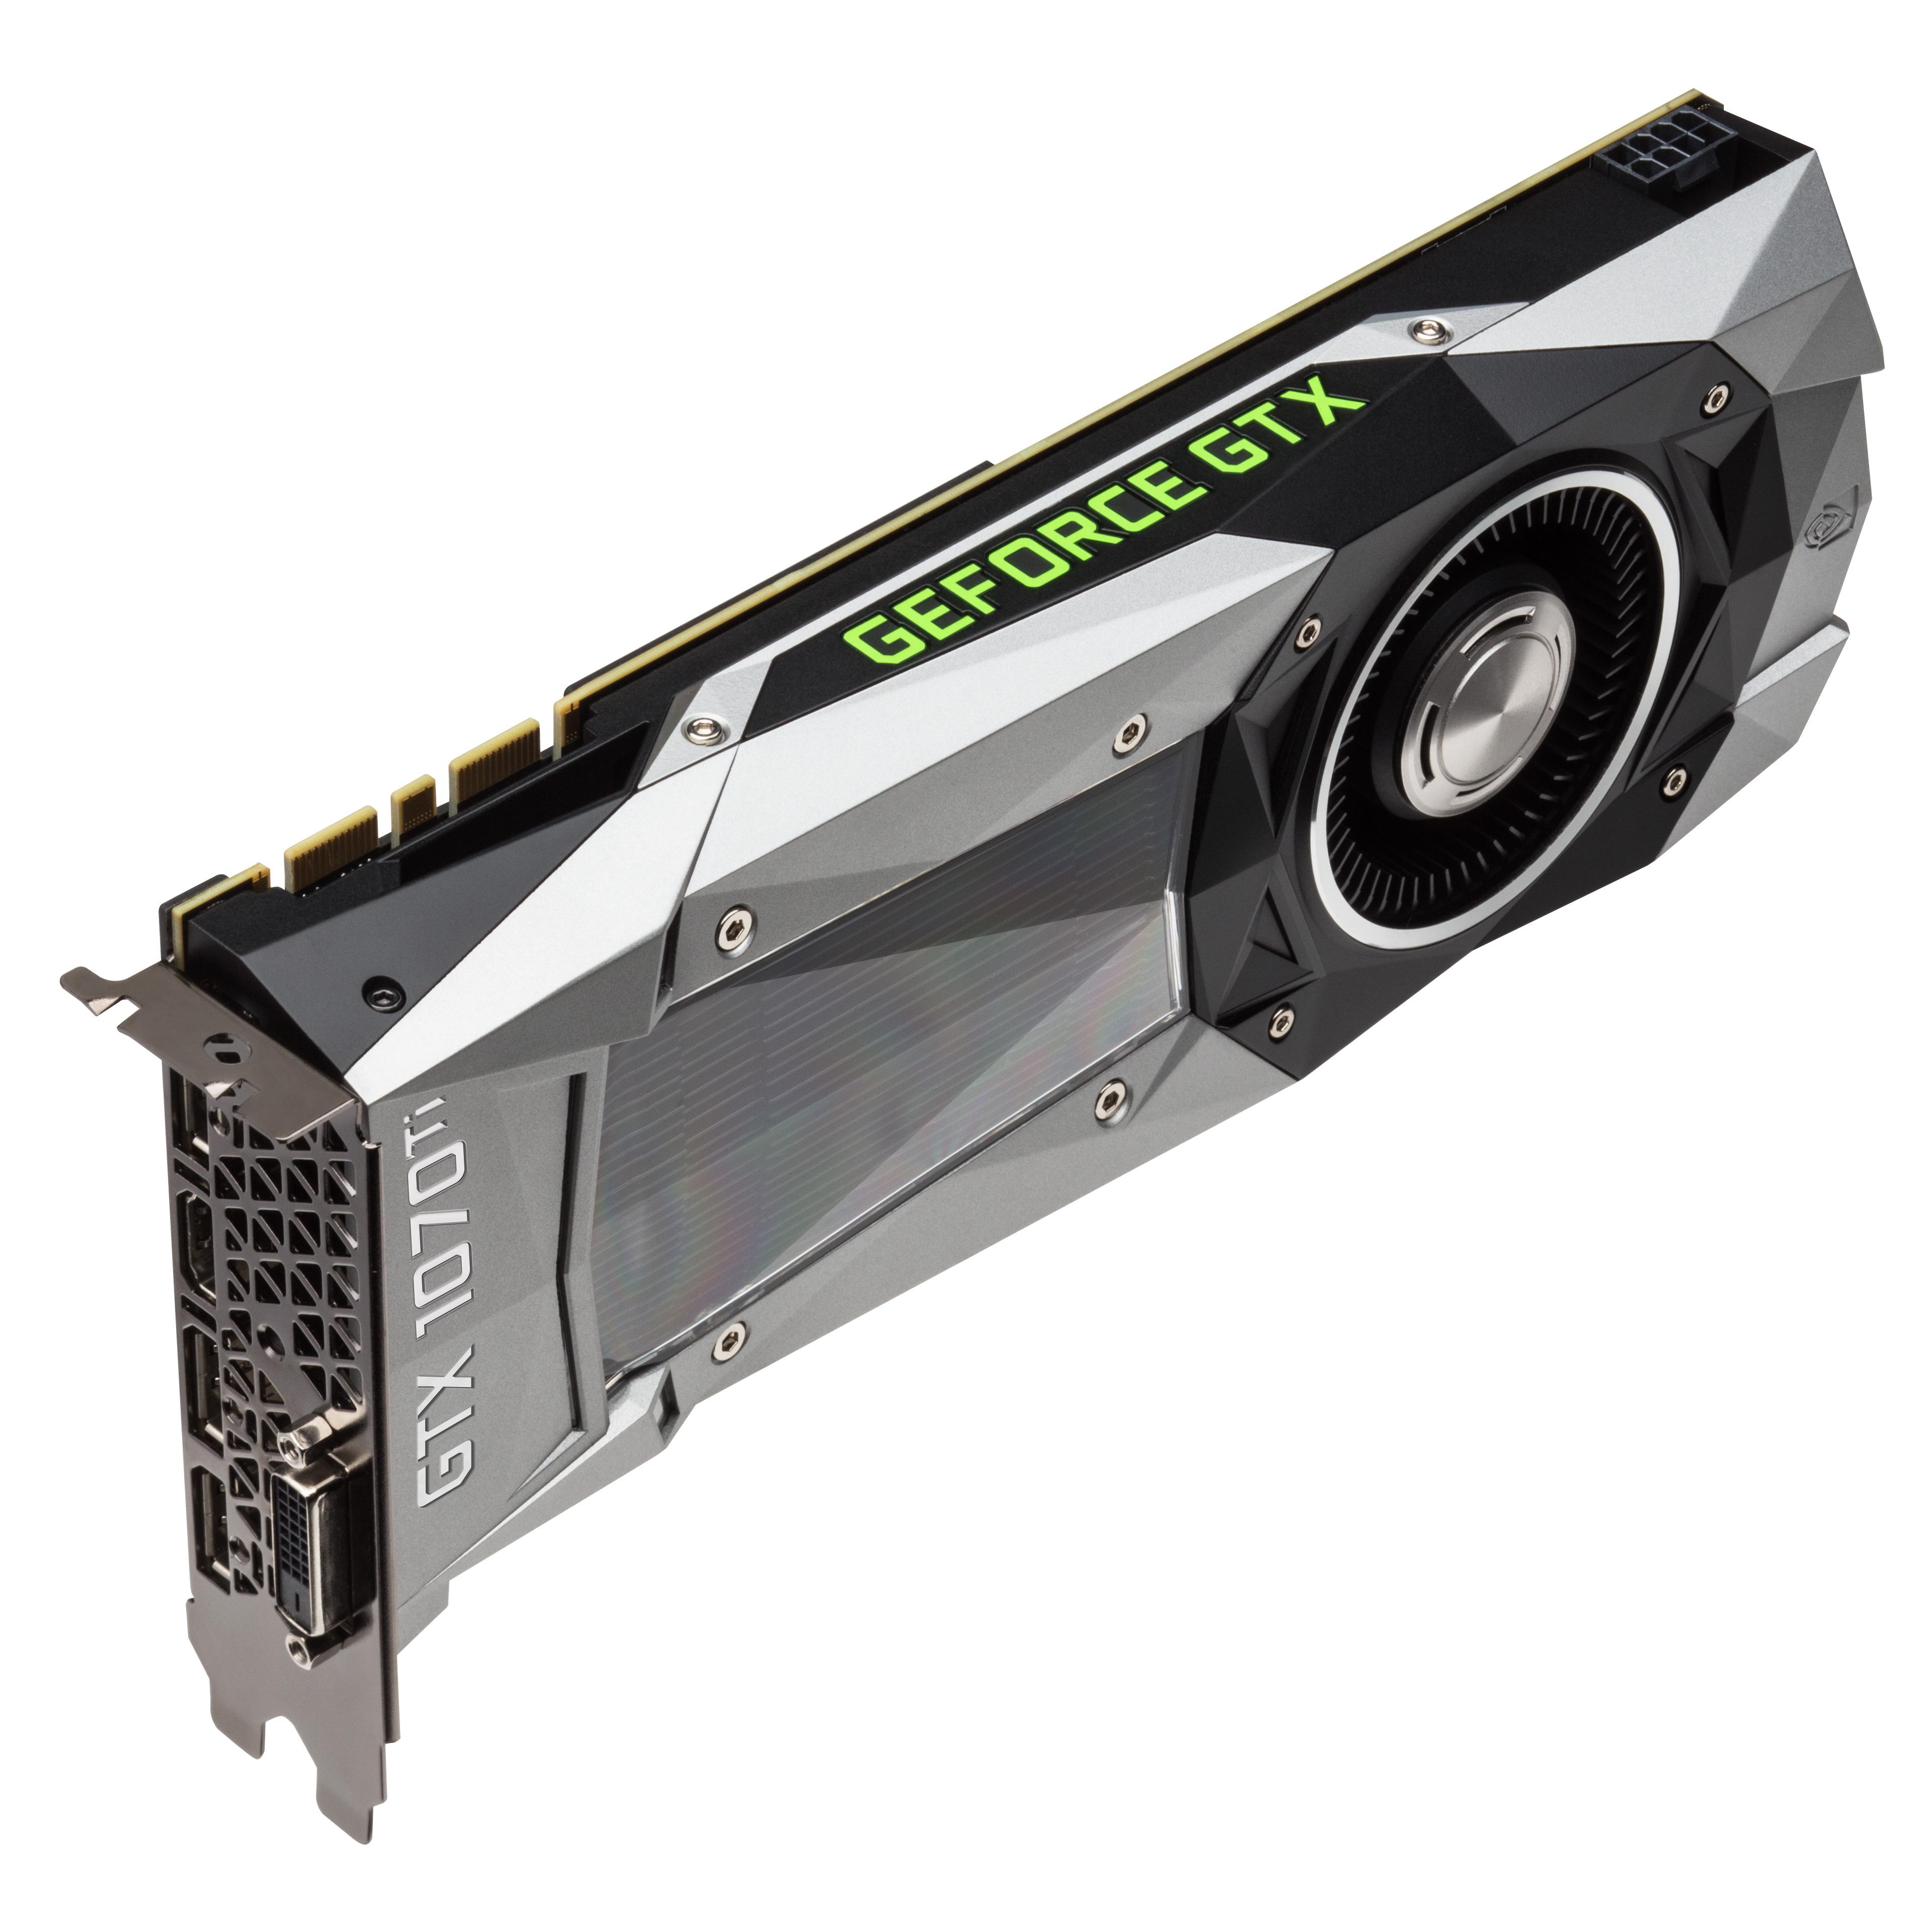 ▷ Drako Mining RIG PRO (6 GPU, GTX ), Drako's Bundle, ,luigirota.it - Extreme modding